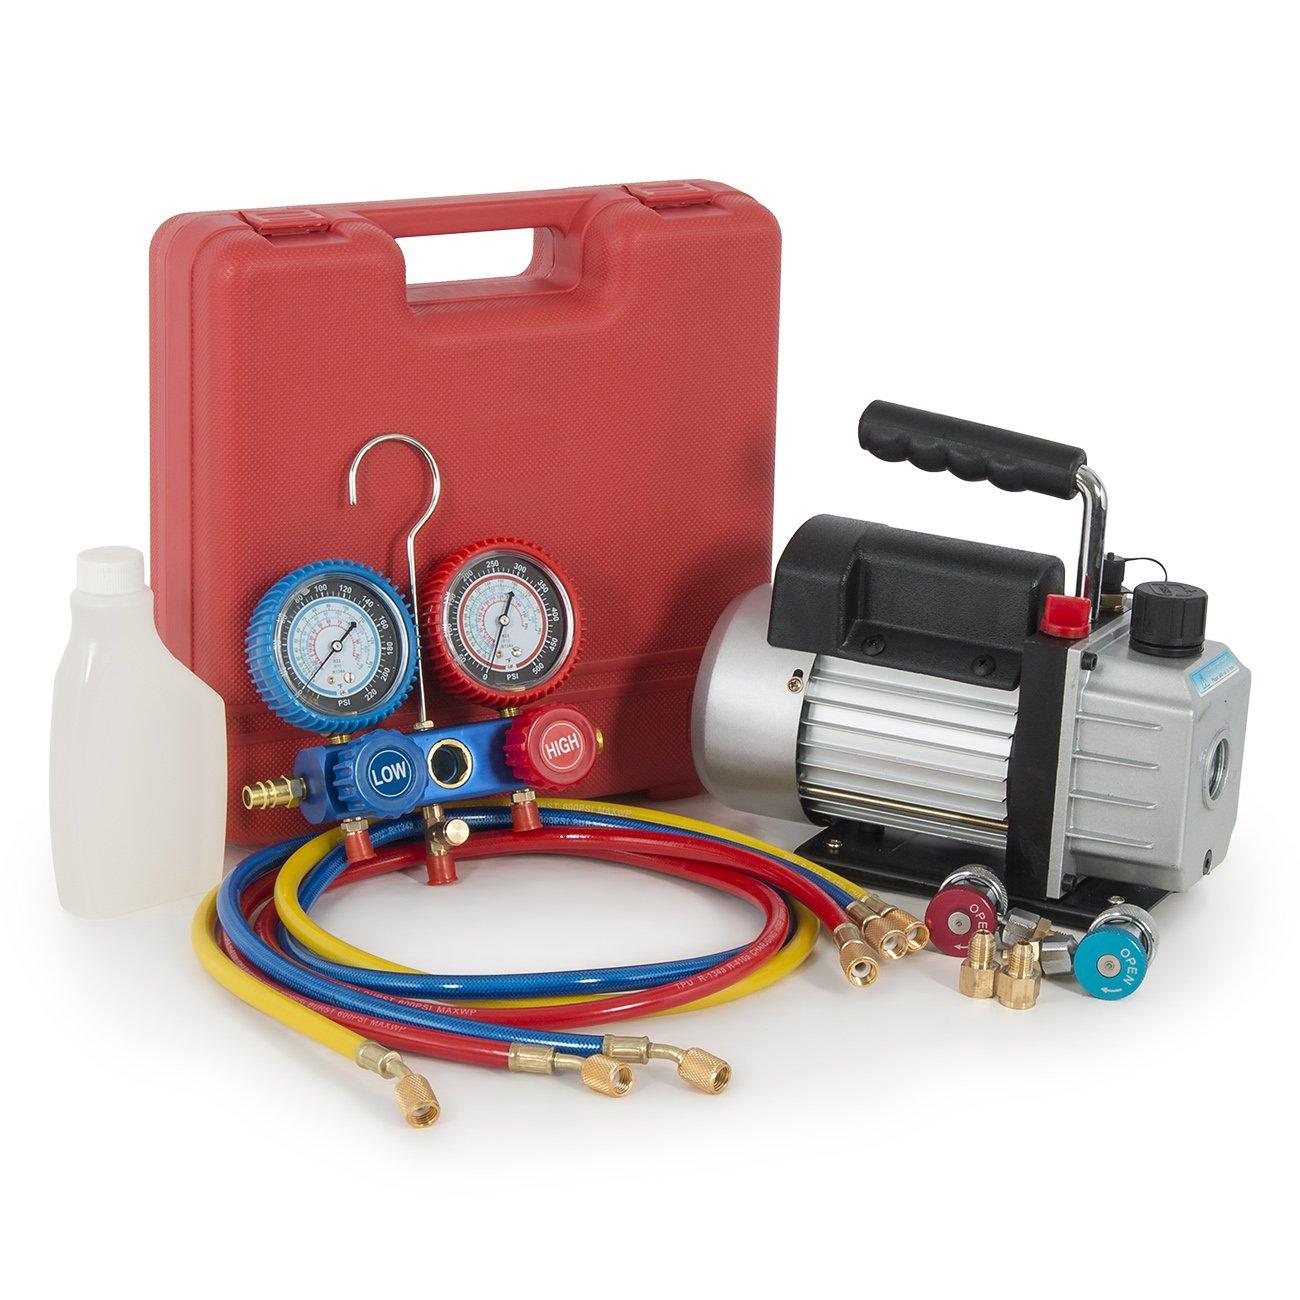 R134a Manifold + 3CFM Vacuum Pump